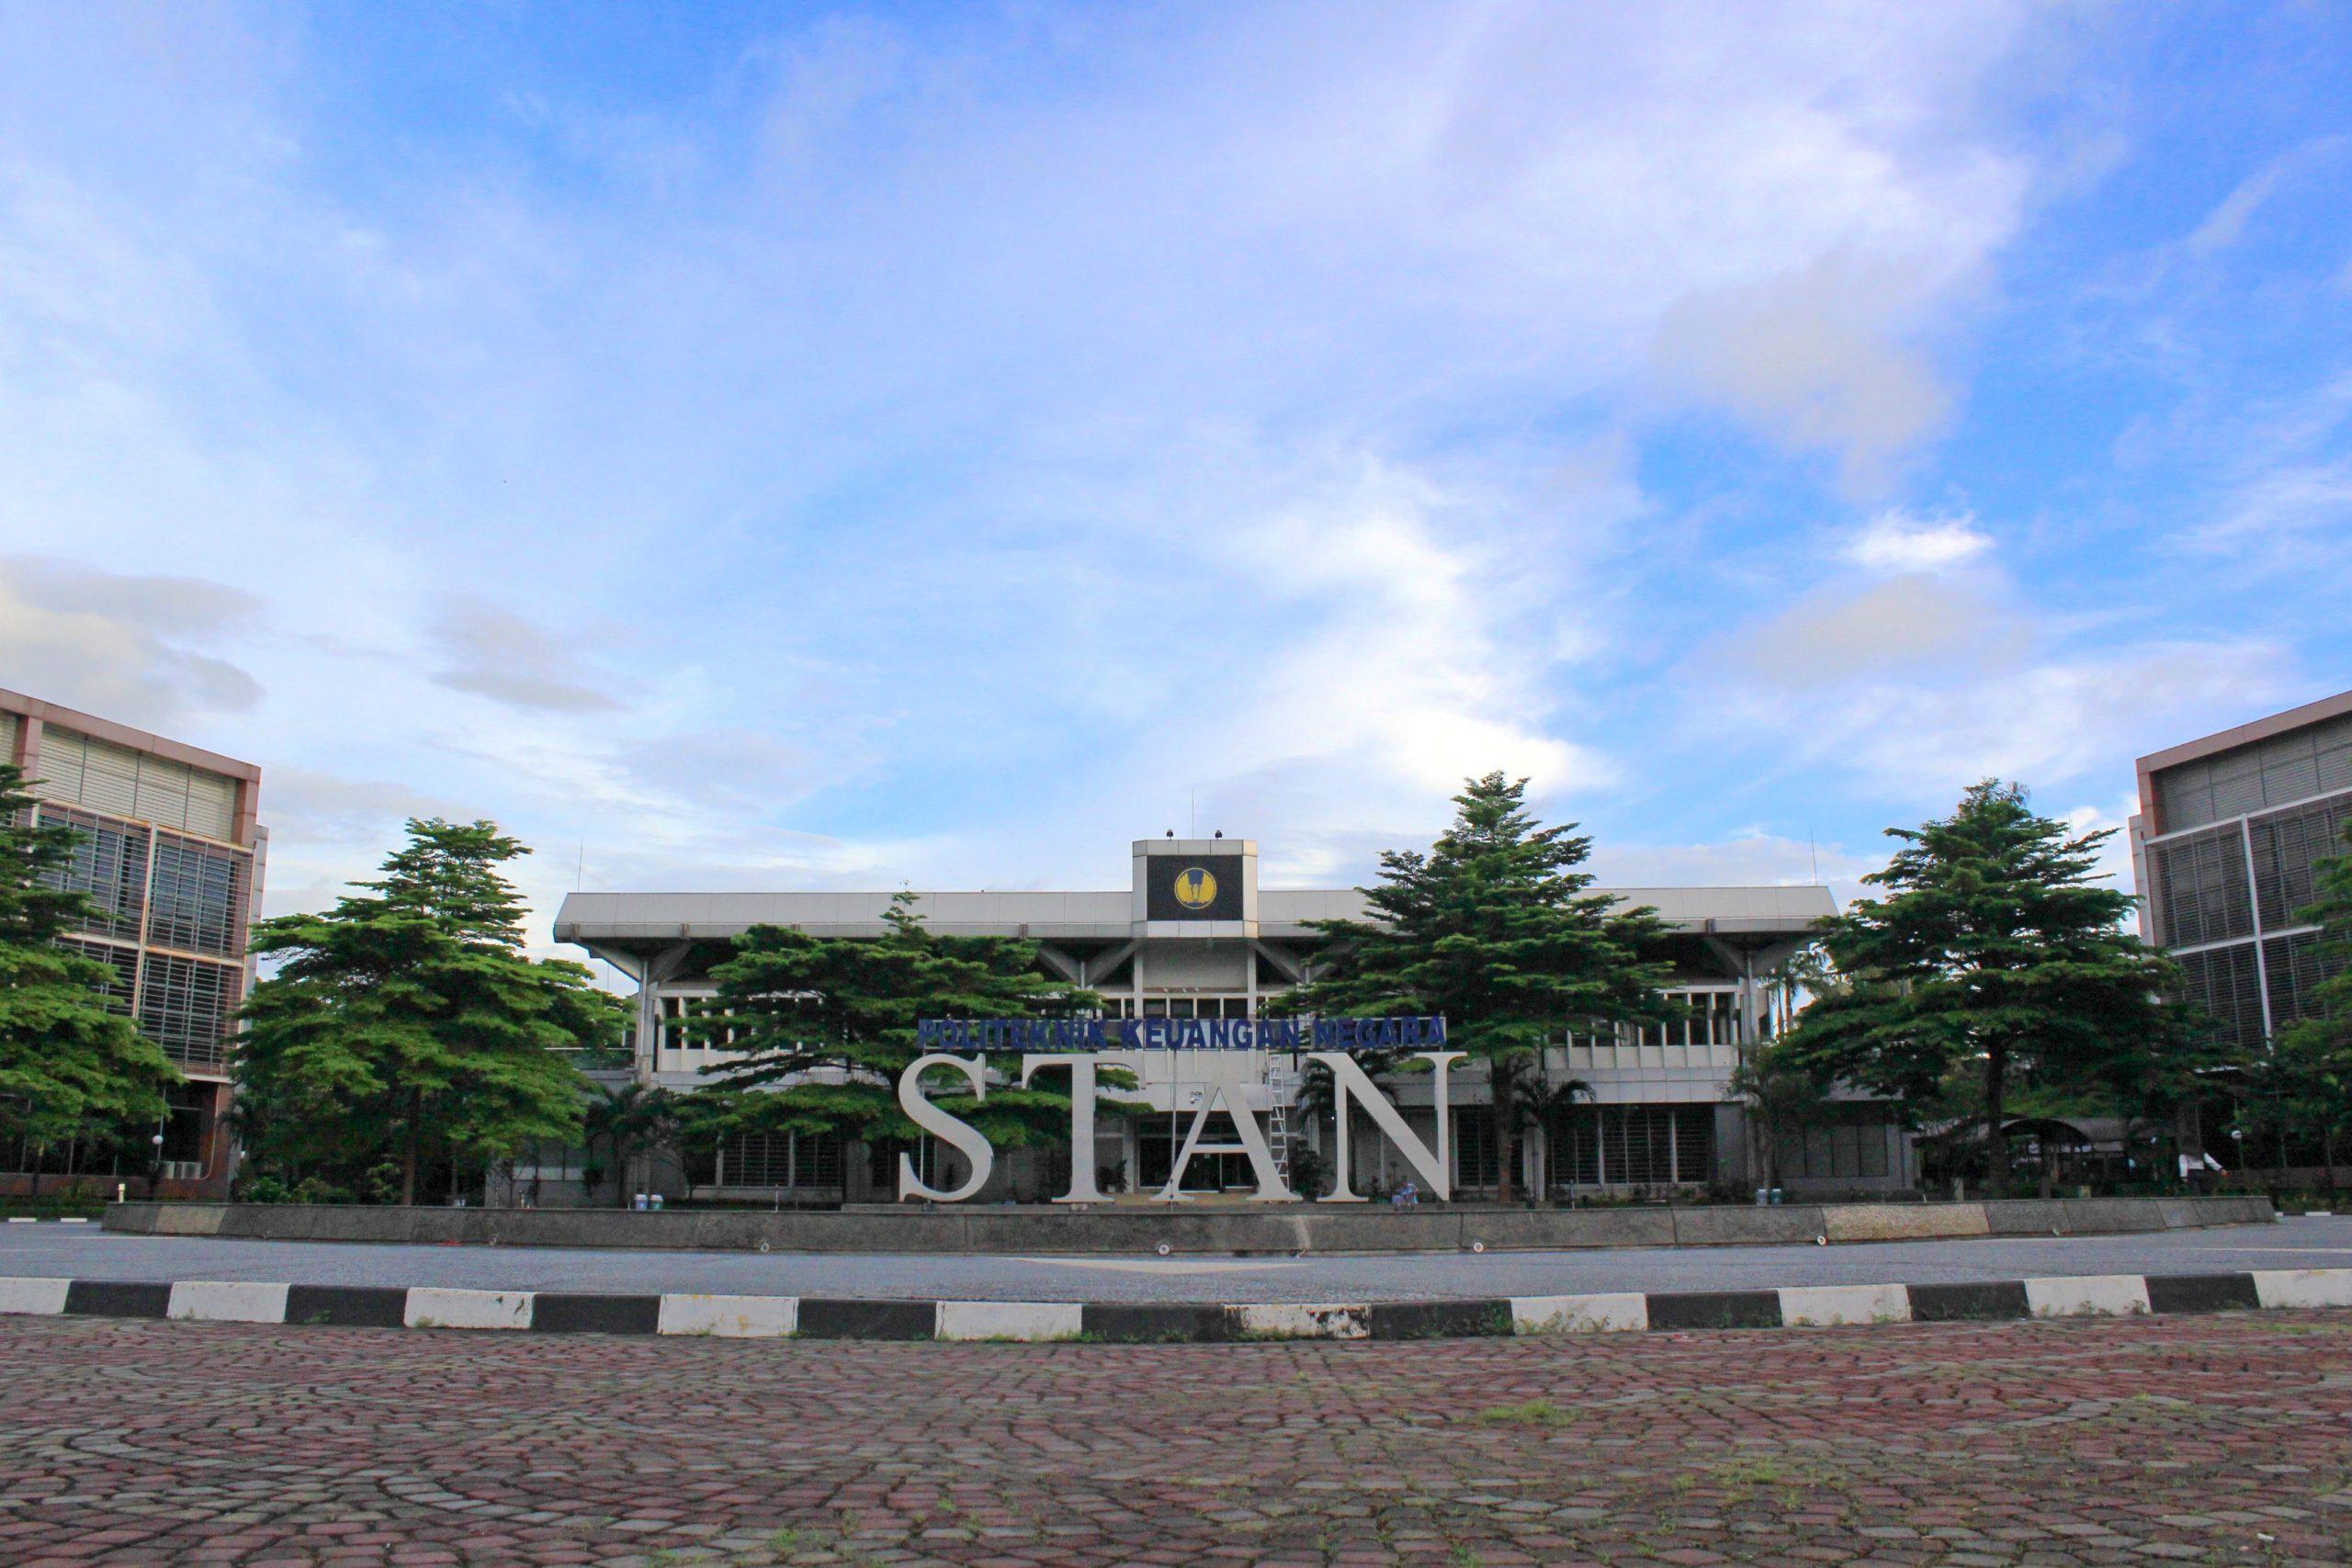 Pendaftaran PKN STAN untuk Lulusan SMA/SMK/MA (Beasiswa & Ikatan Dinas), Deadline 30 APRIL 2021